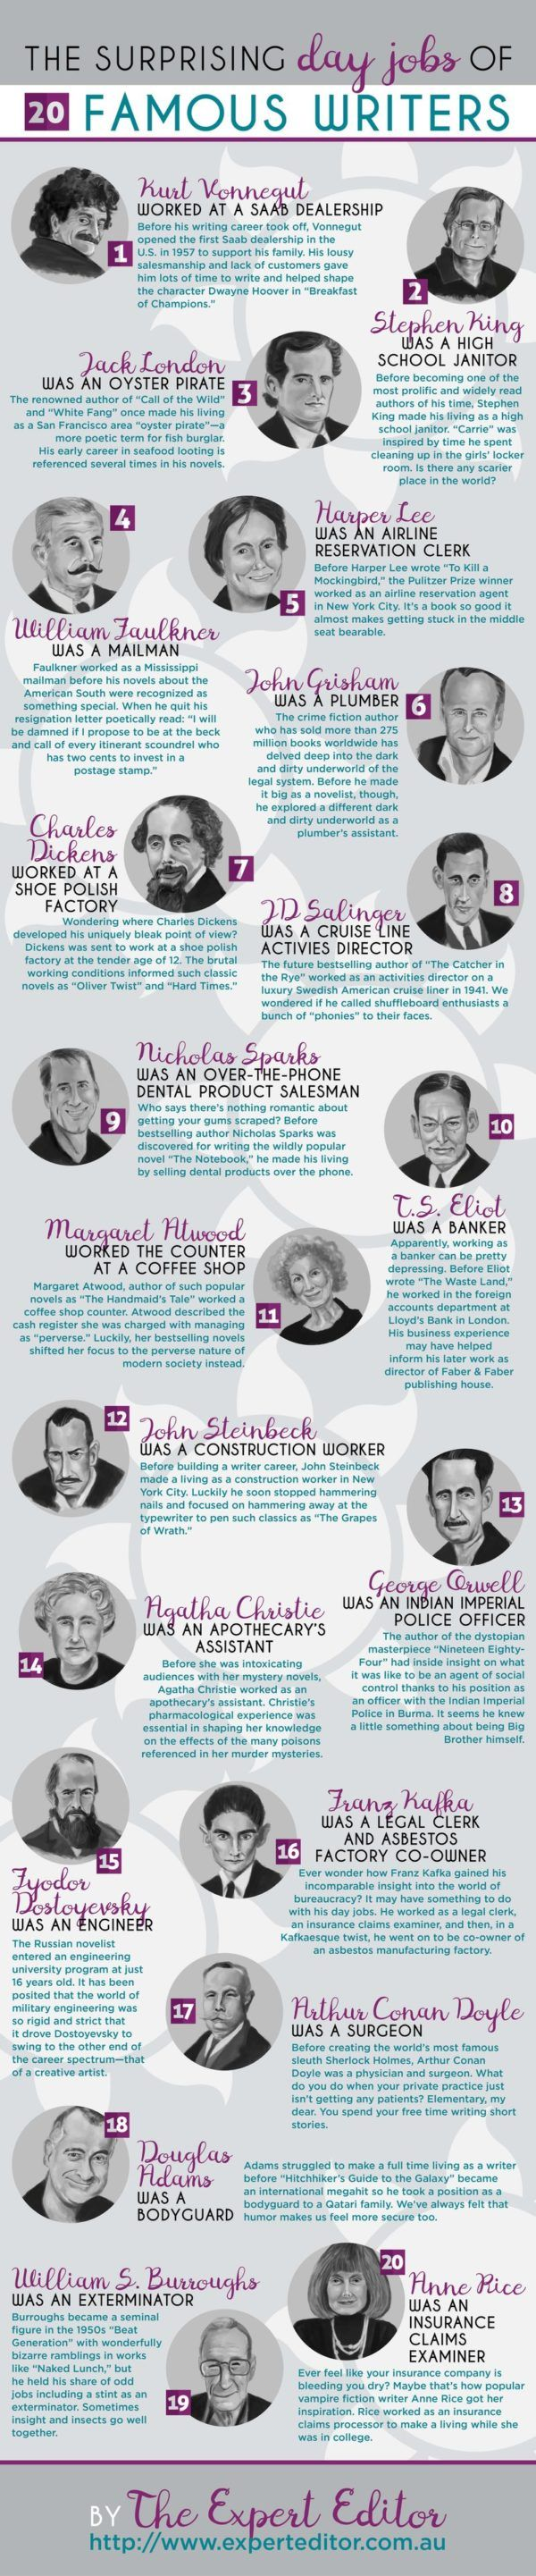 Douglas Adams was a bodyguard, John Grisham was a plumber #Infographic #scrittori